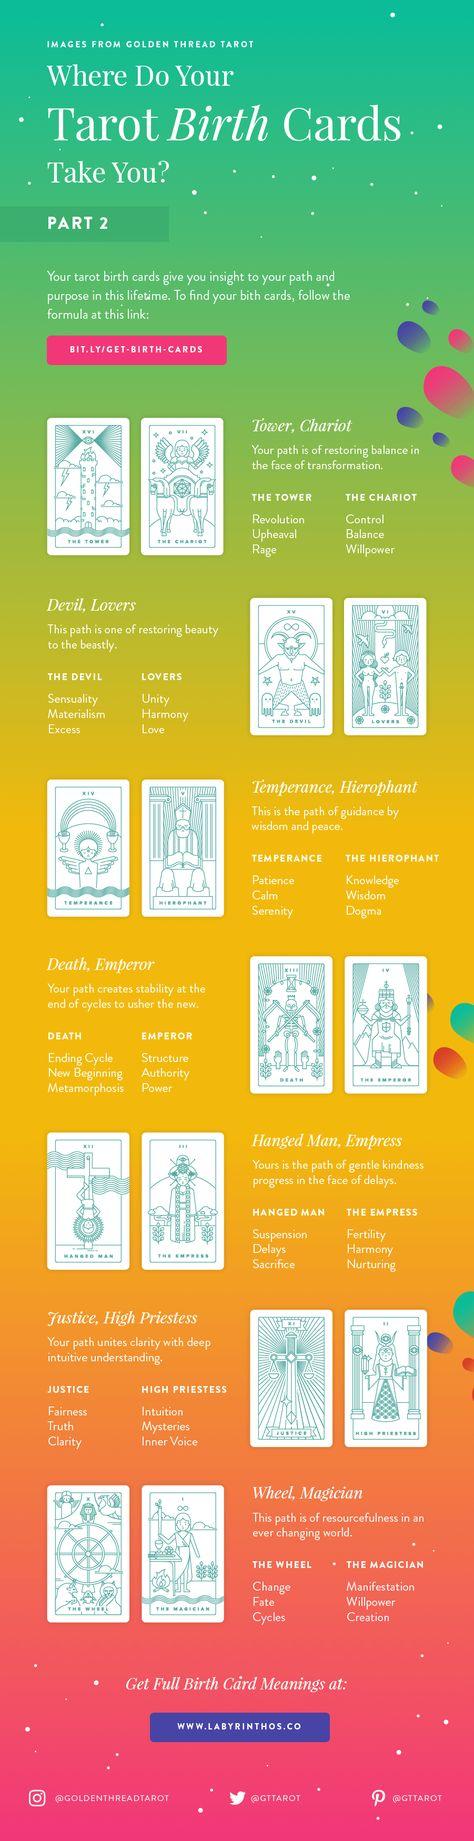 Astrology tarot correspondences your tarot cards by zodiac signs astrology tarot correspondences your tarot cards by zodiac signs infographic zodiac zodiac art and horoscopes geenschuldenfo Choice Image